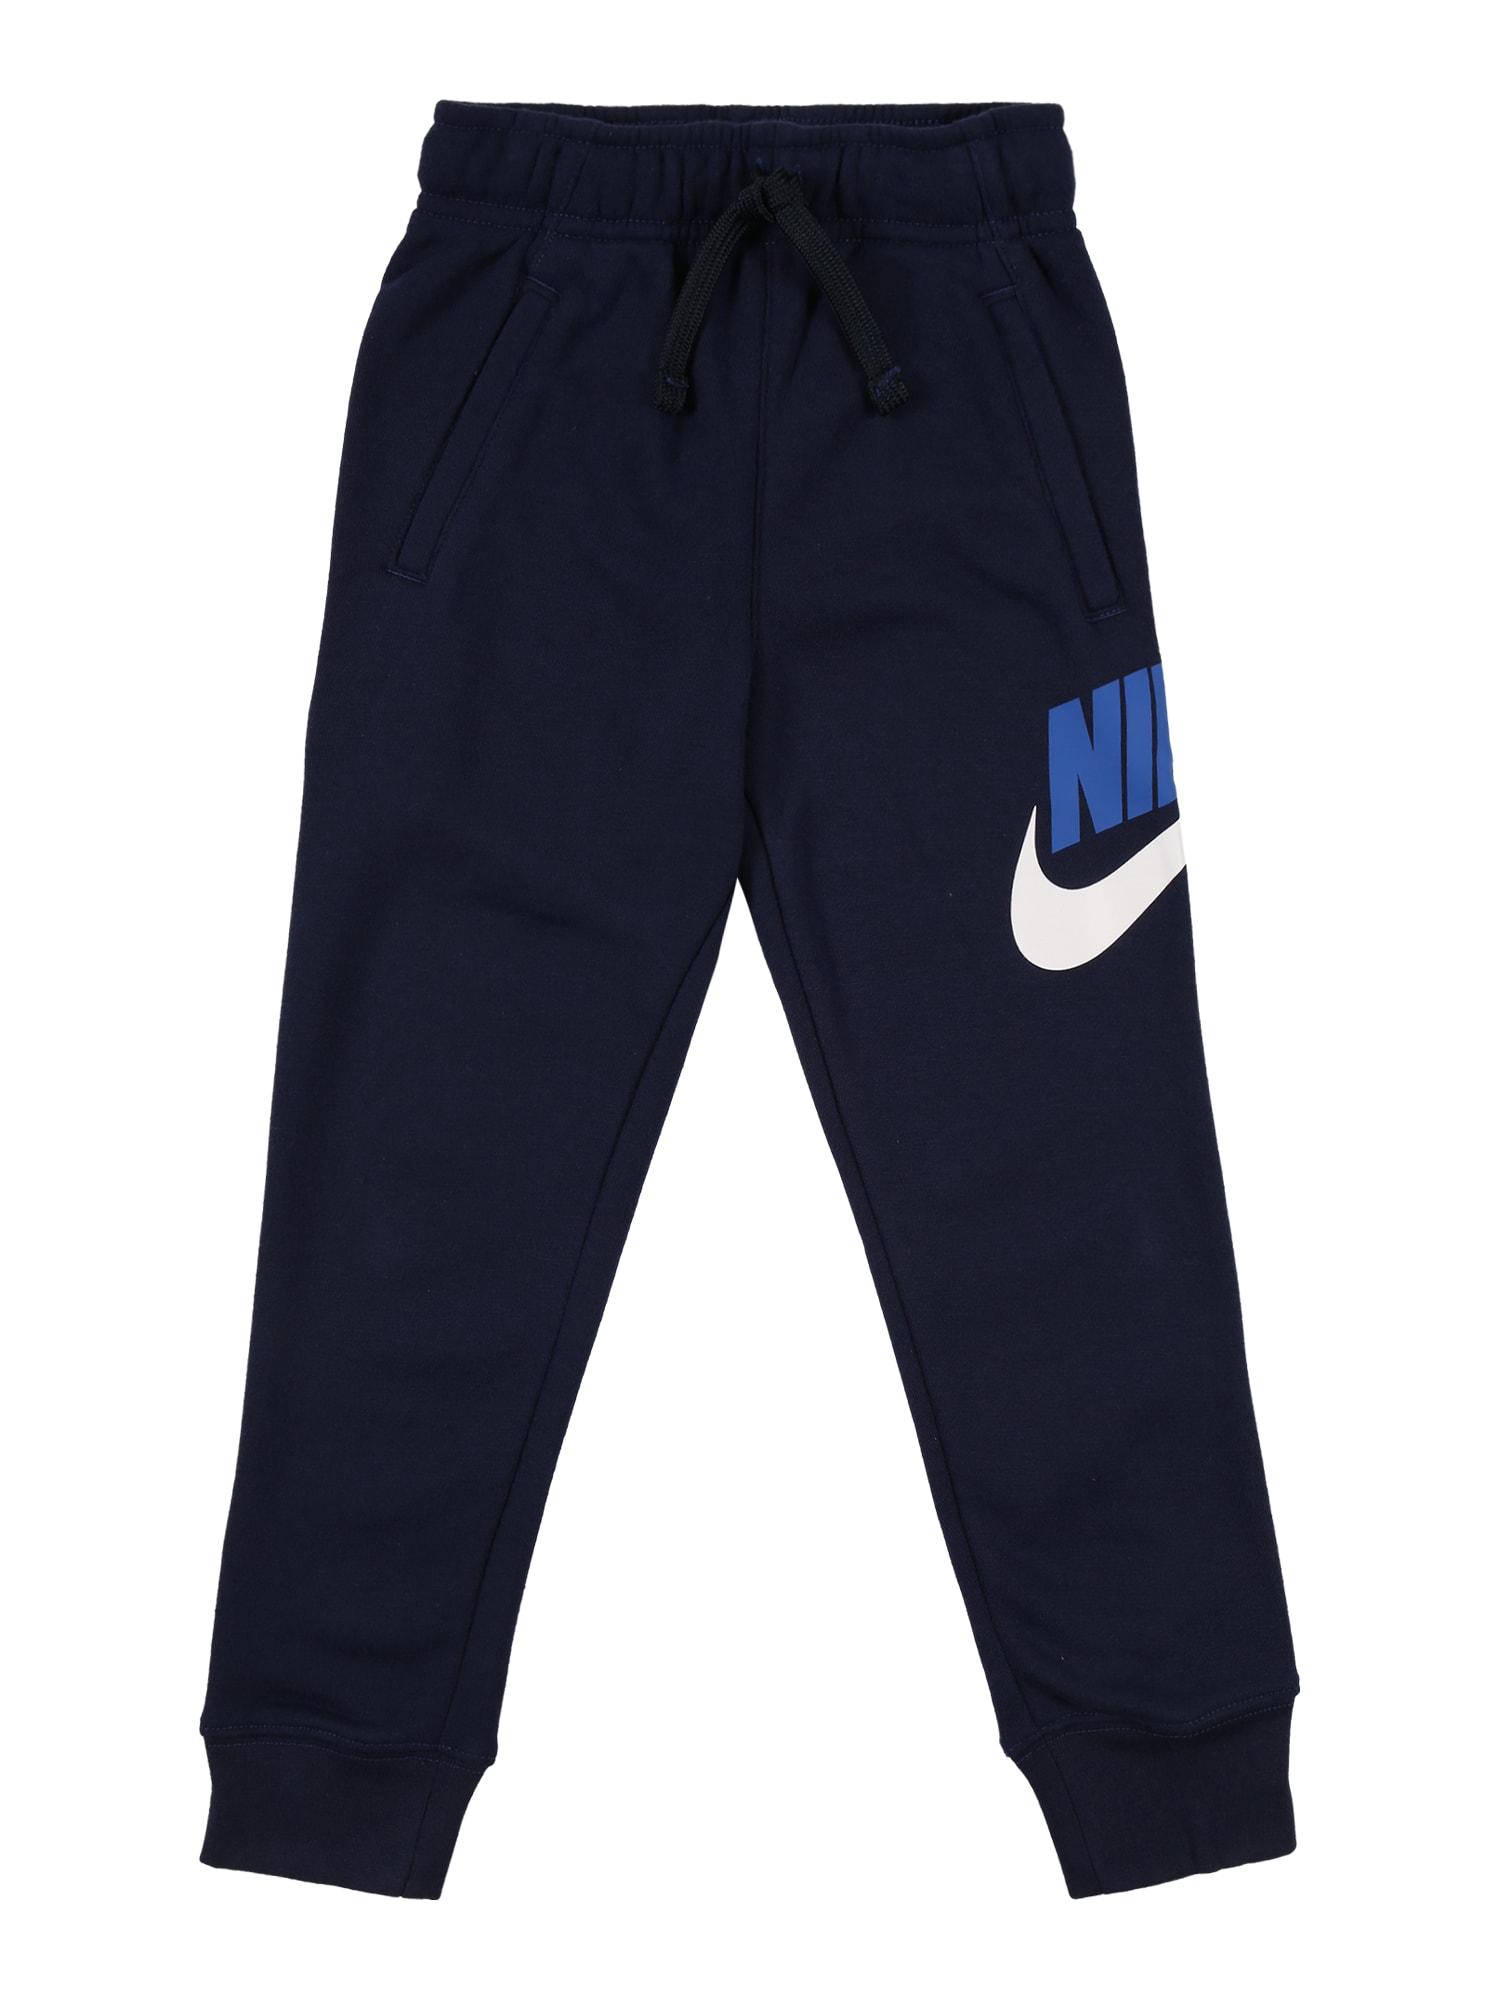 Nike Sportswear Kelnės balta / tamsiai mėlyna / dangaus žydra